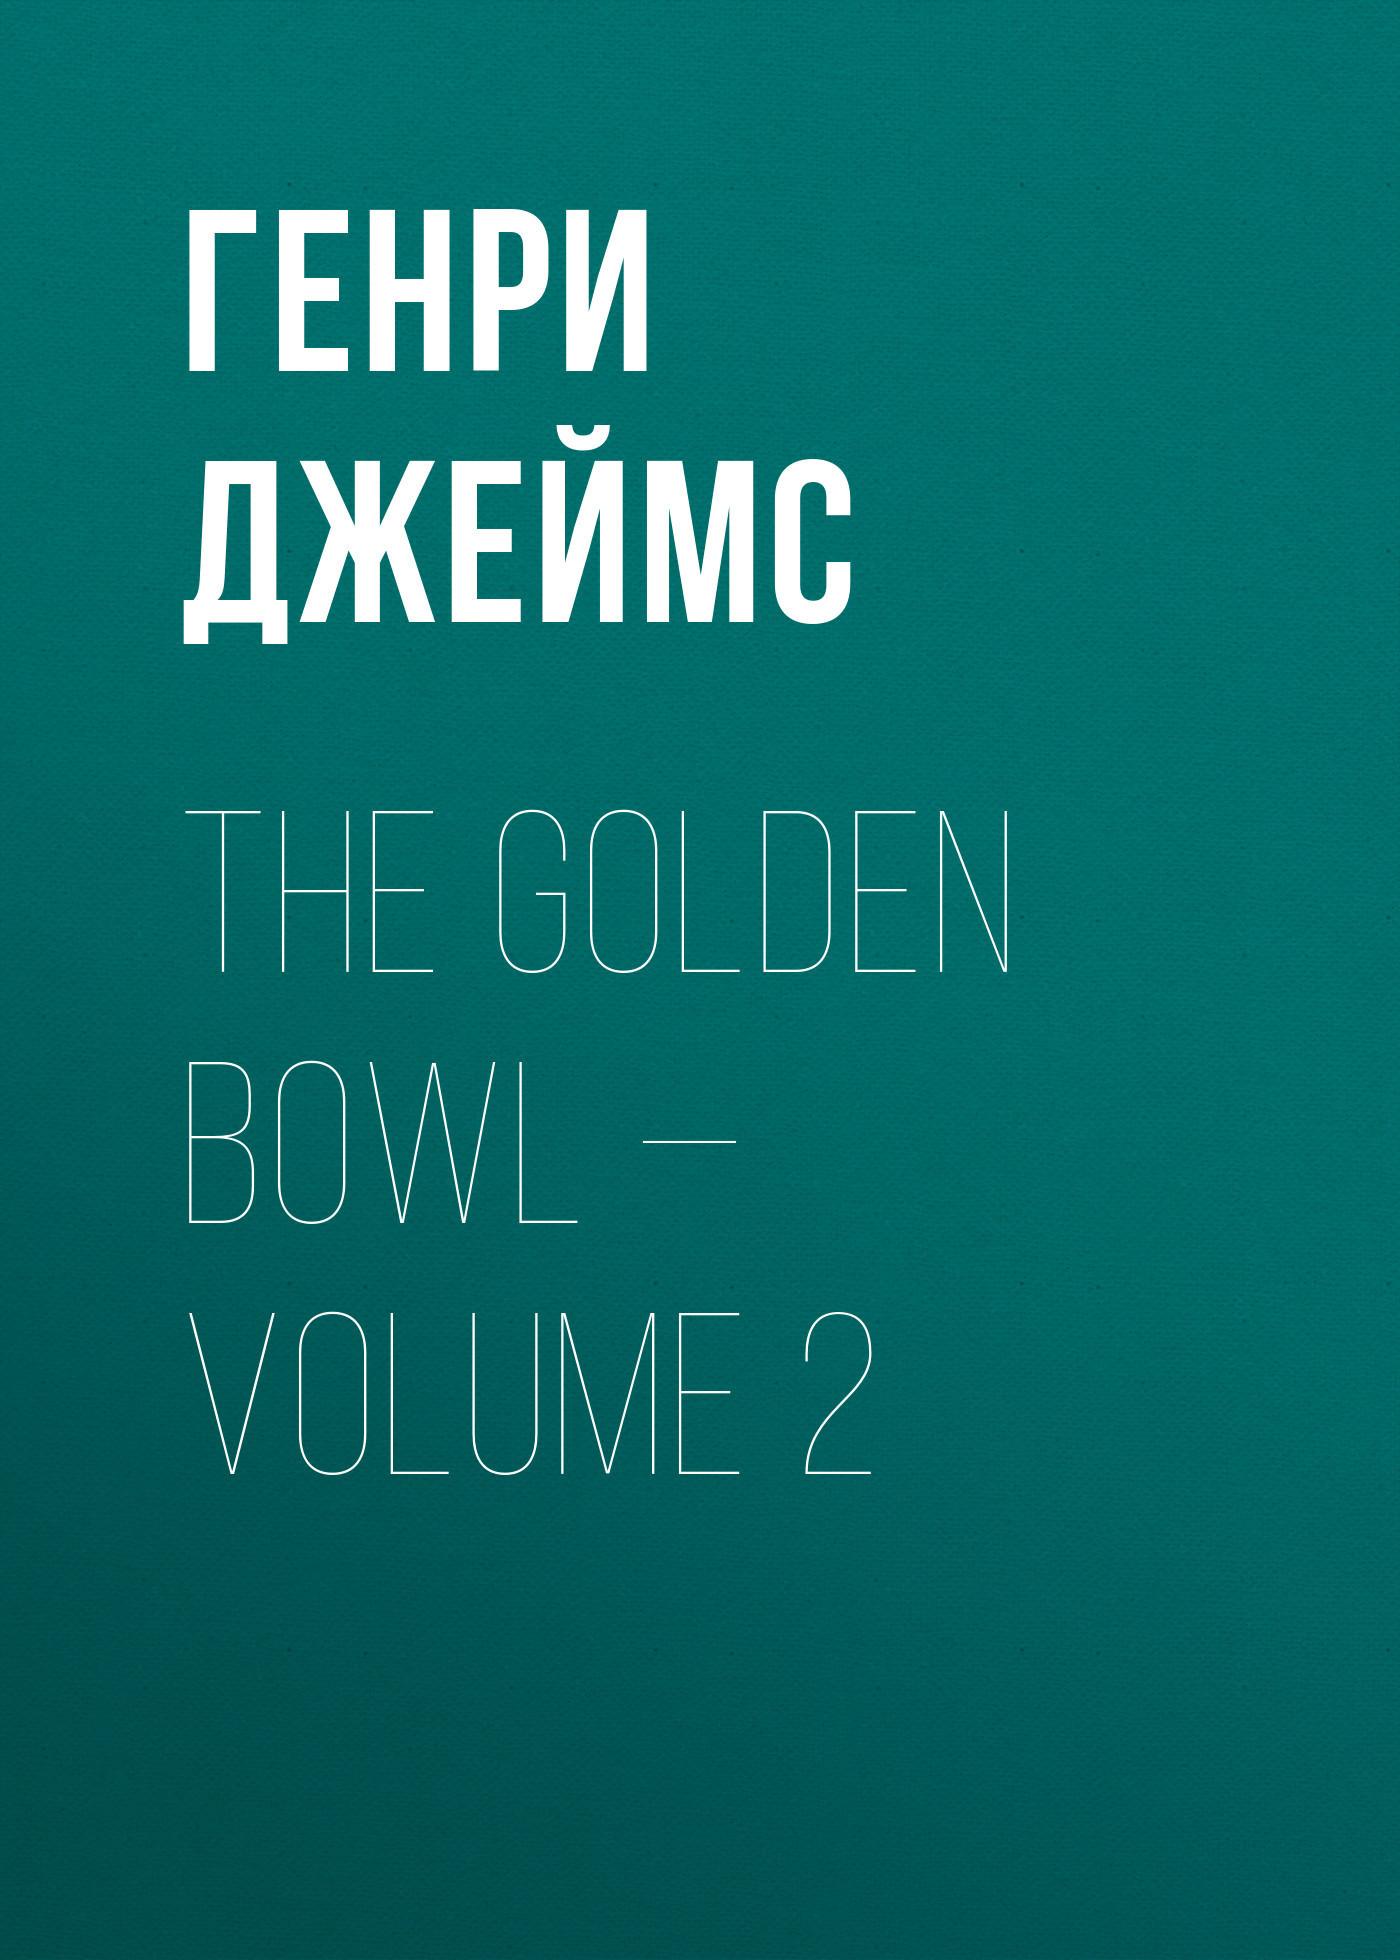 Генри Джеймс The Golden Bowl — Volume 2